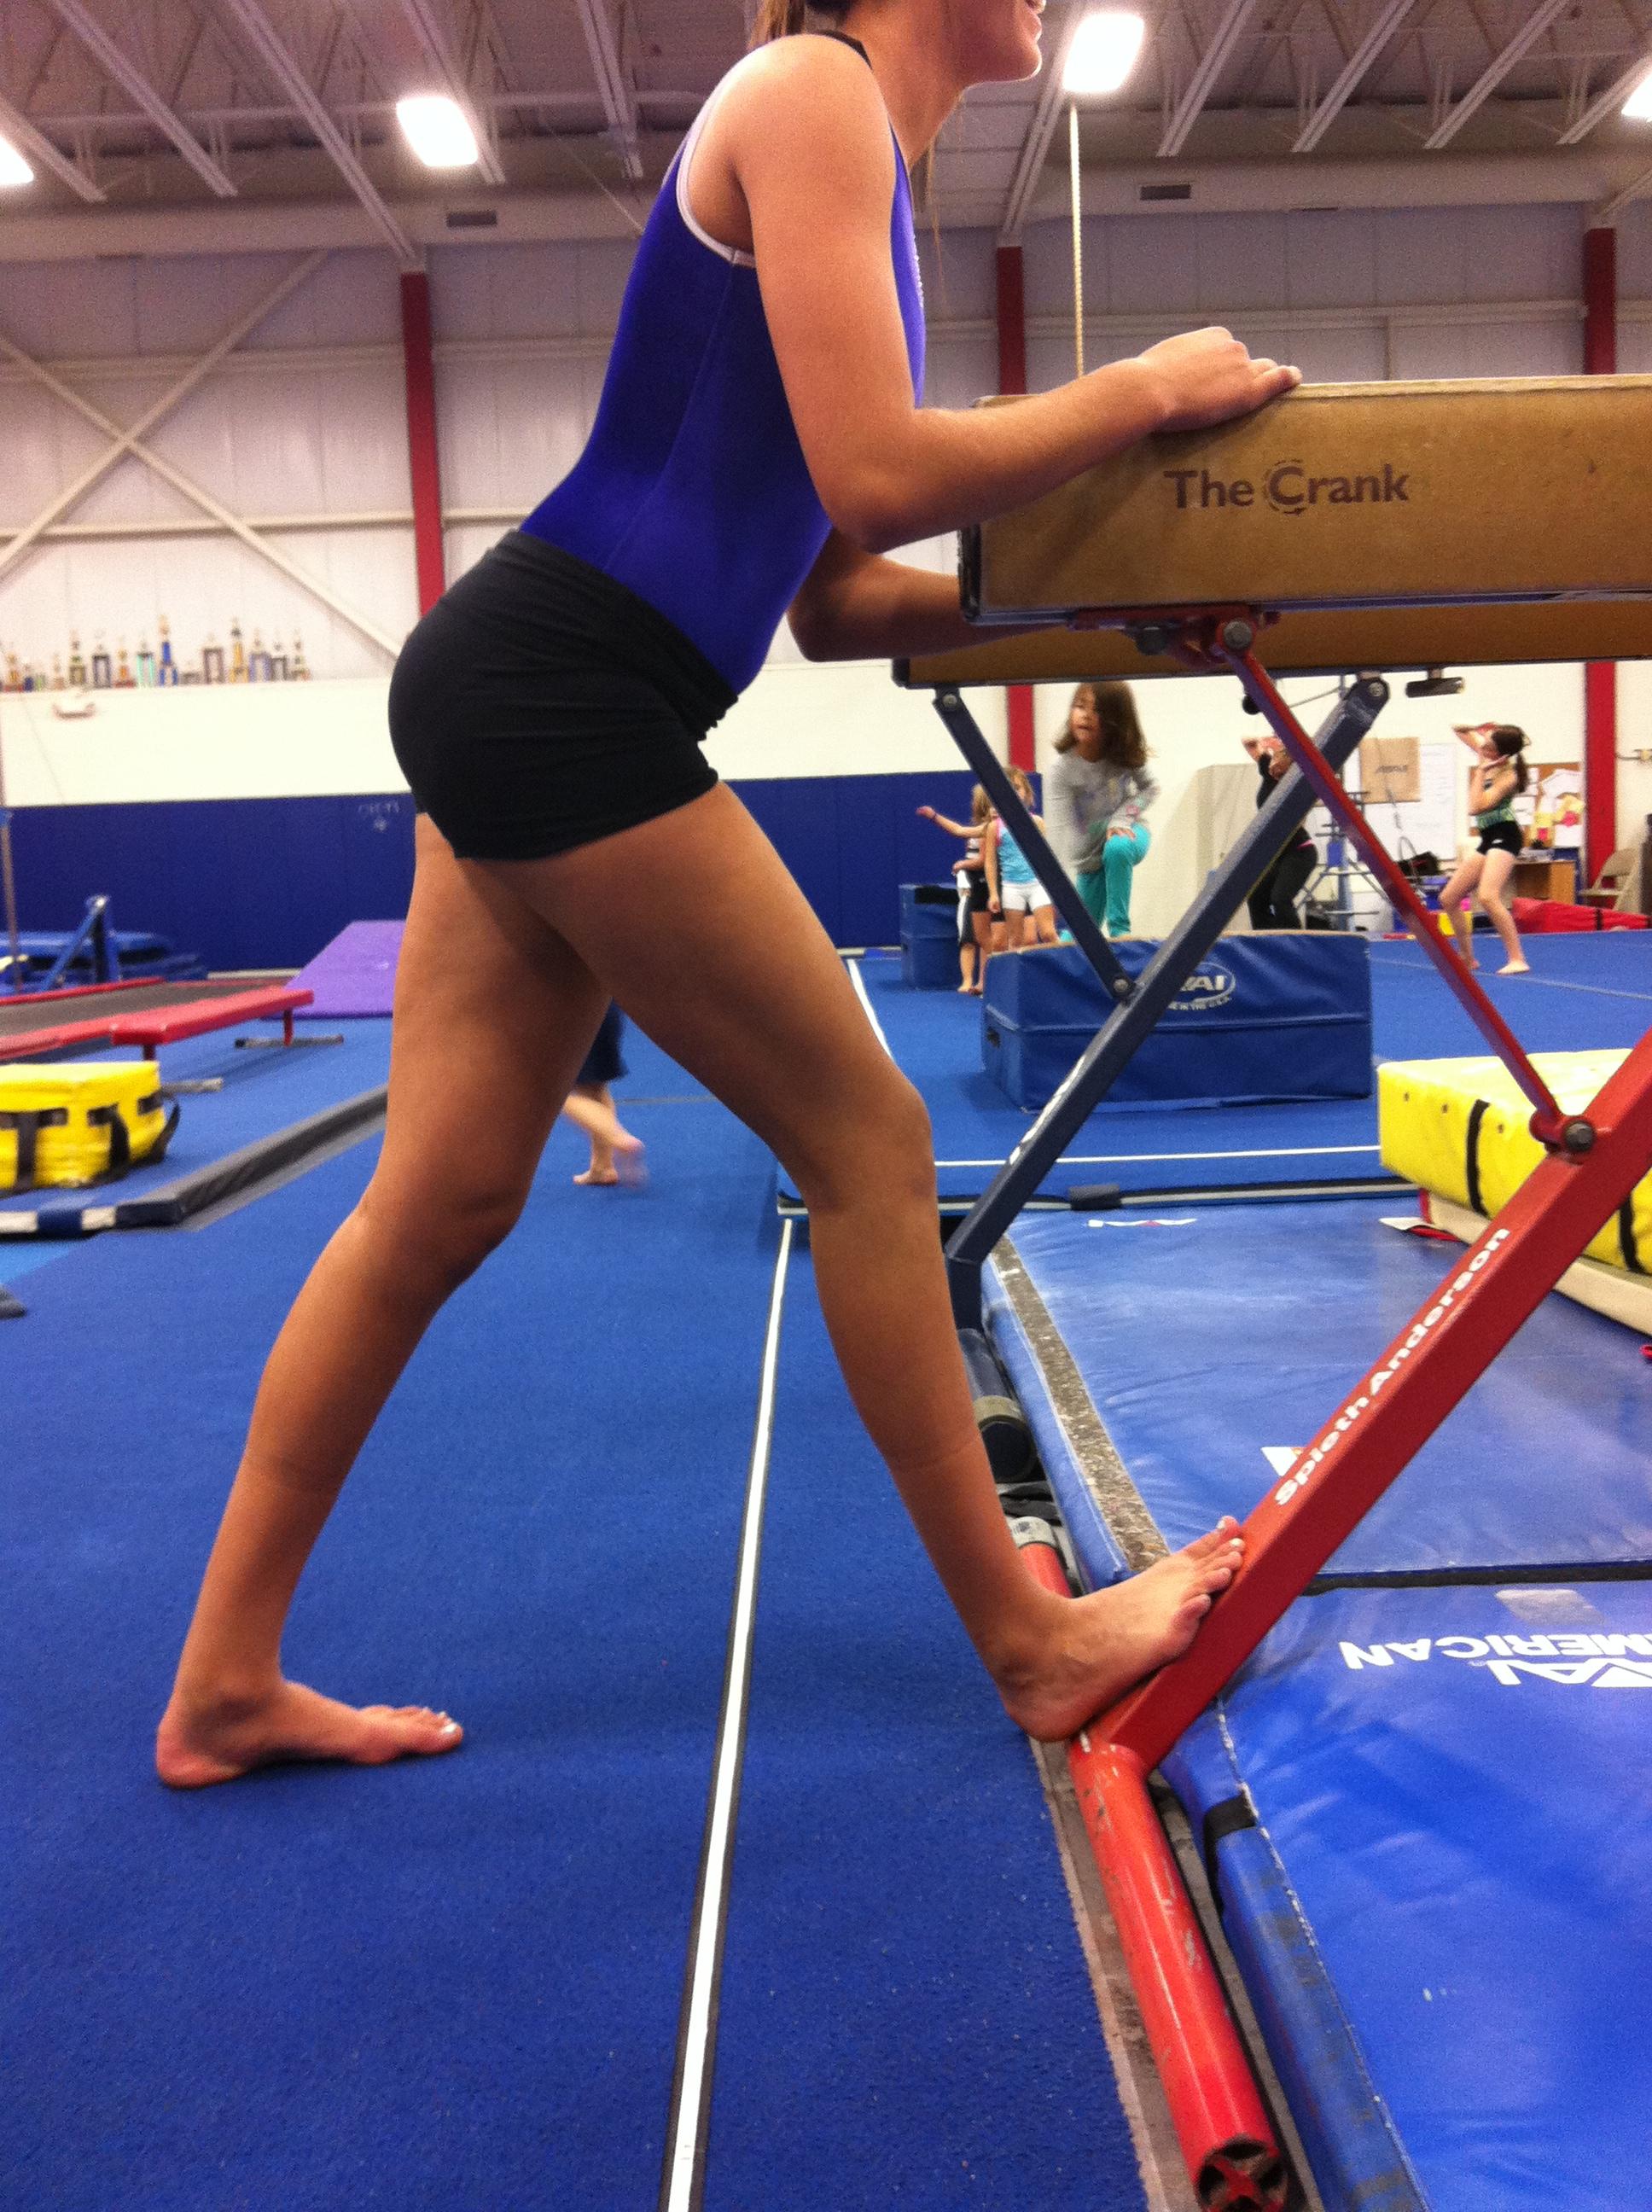 preteen stretch Soleus Stretch Using Beam Base